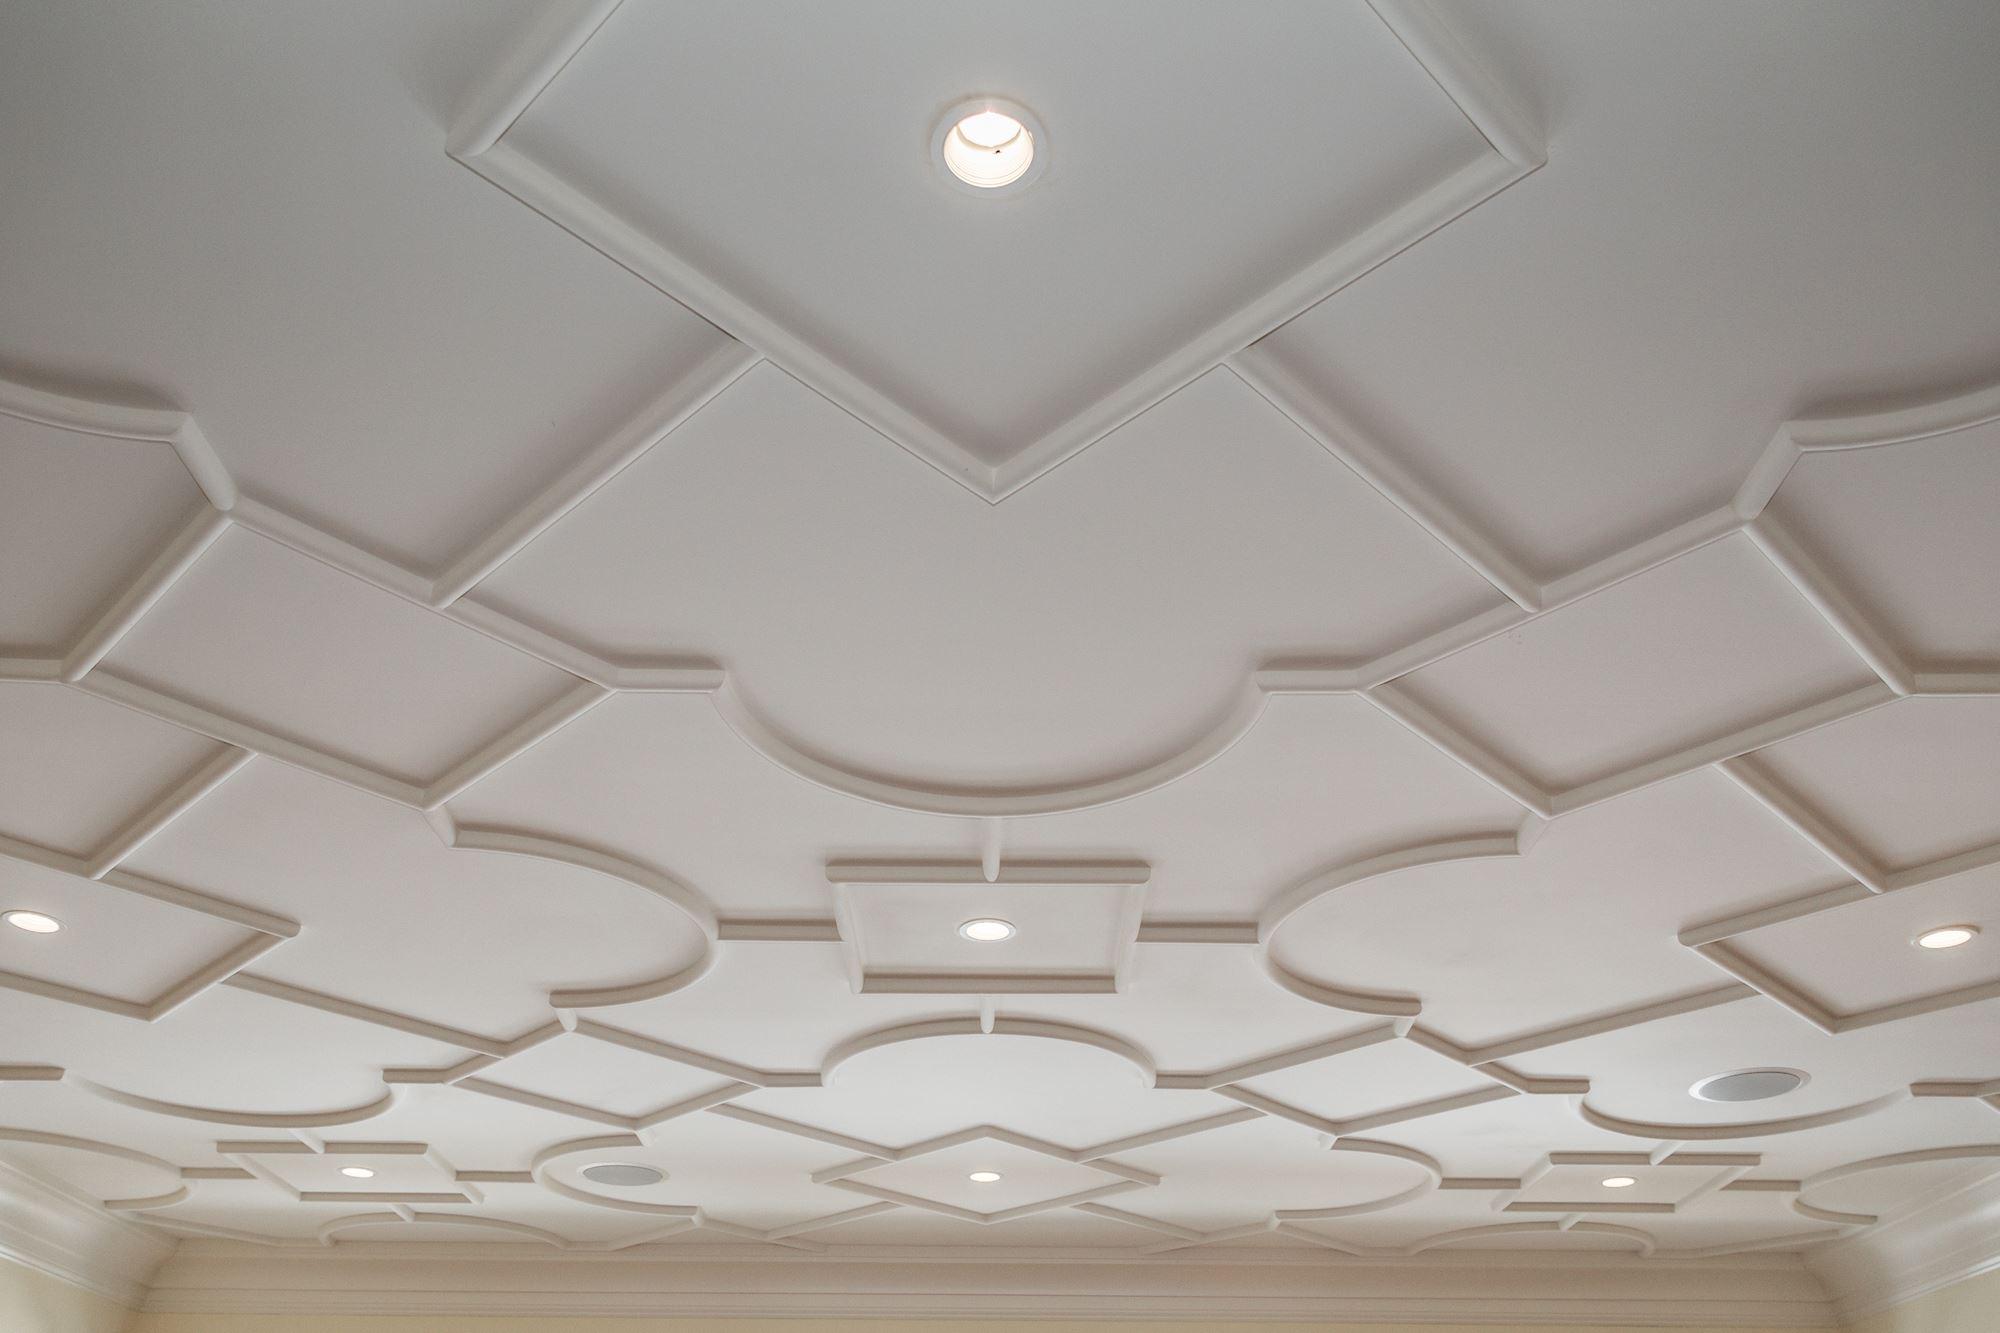 Bethesda Maryland Master Suite Remodeling: 6810 BARRETT LN, BETHESDA, MD 20814